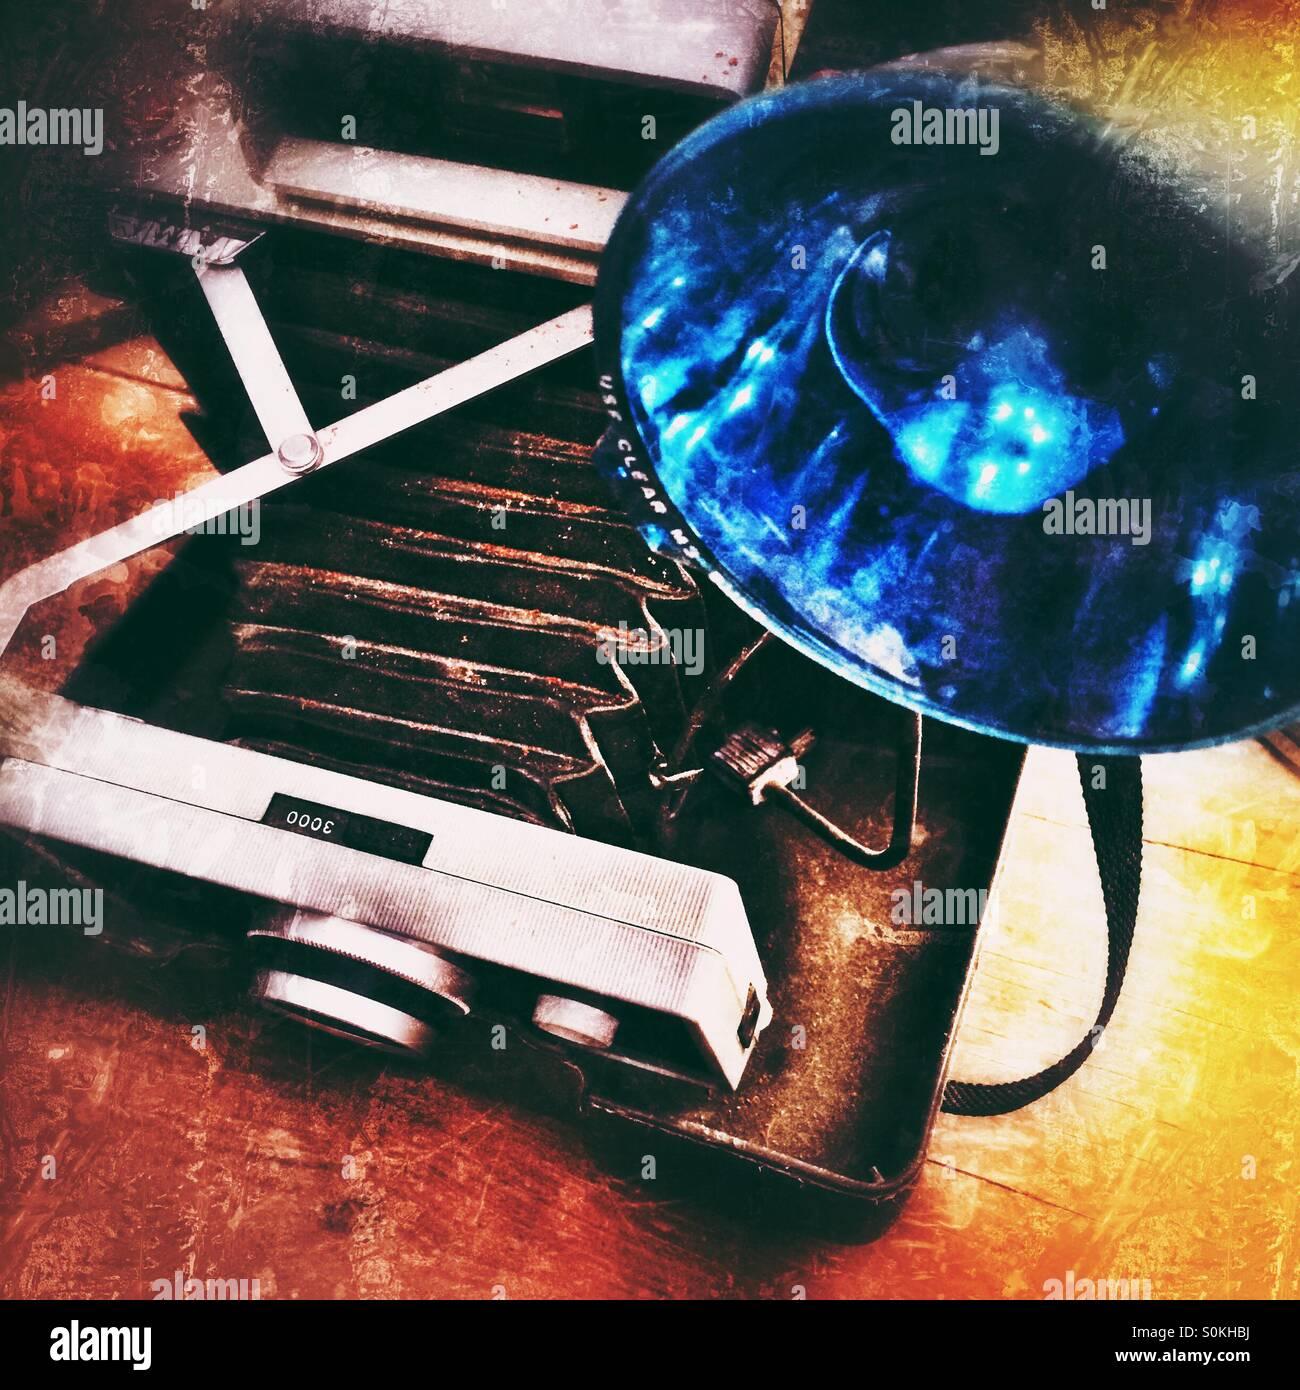 An old camera and blue flashgun - Stock Image